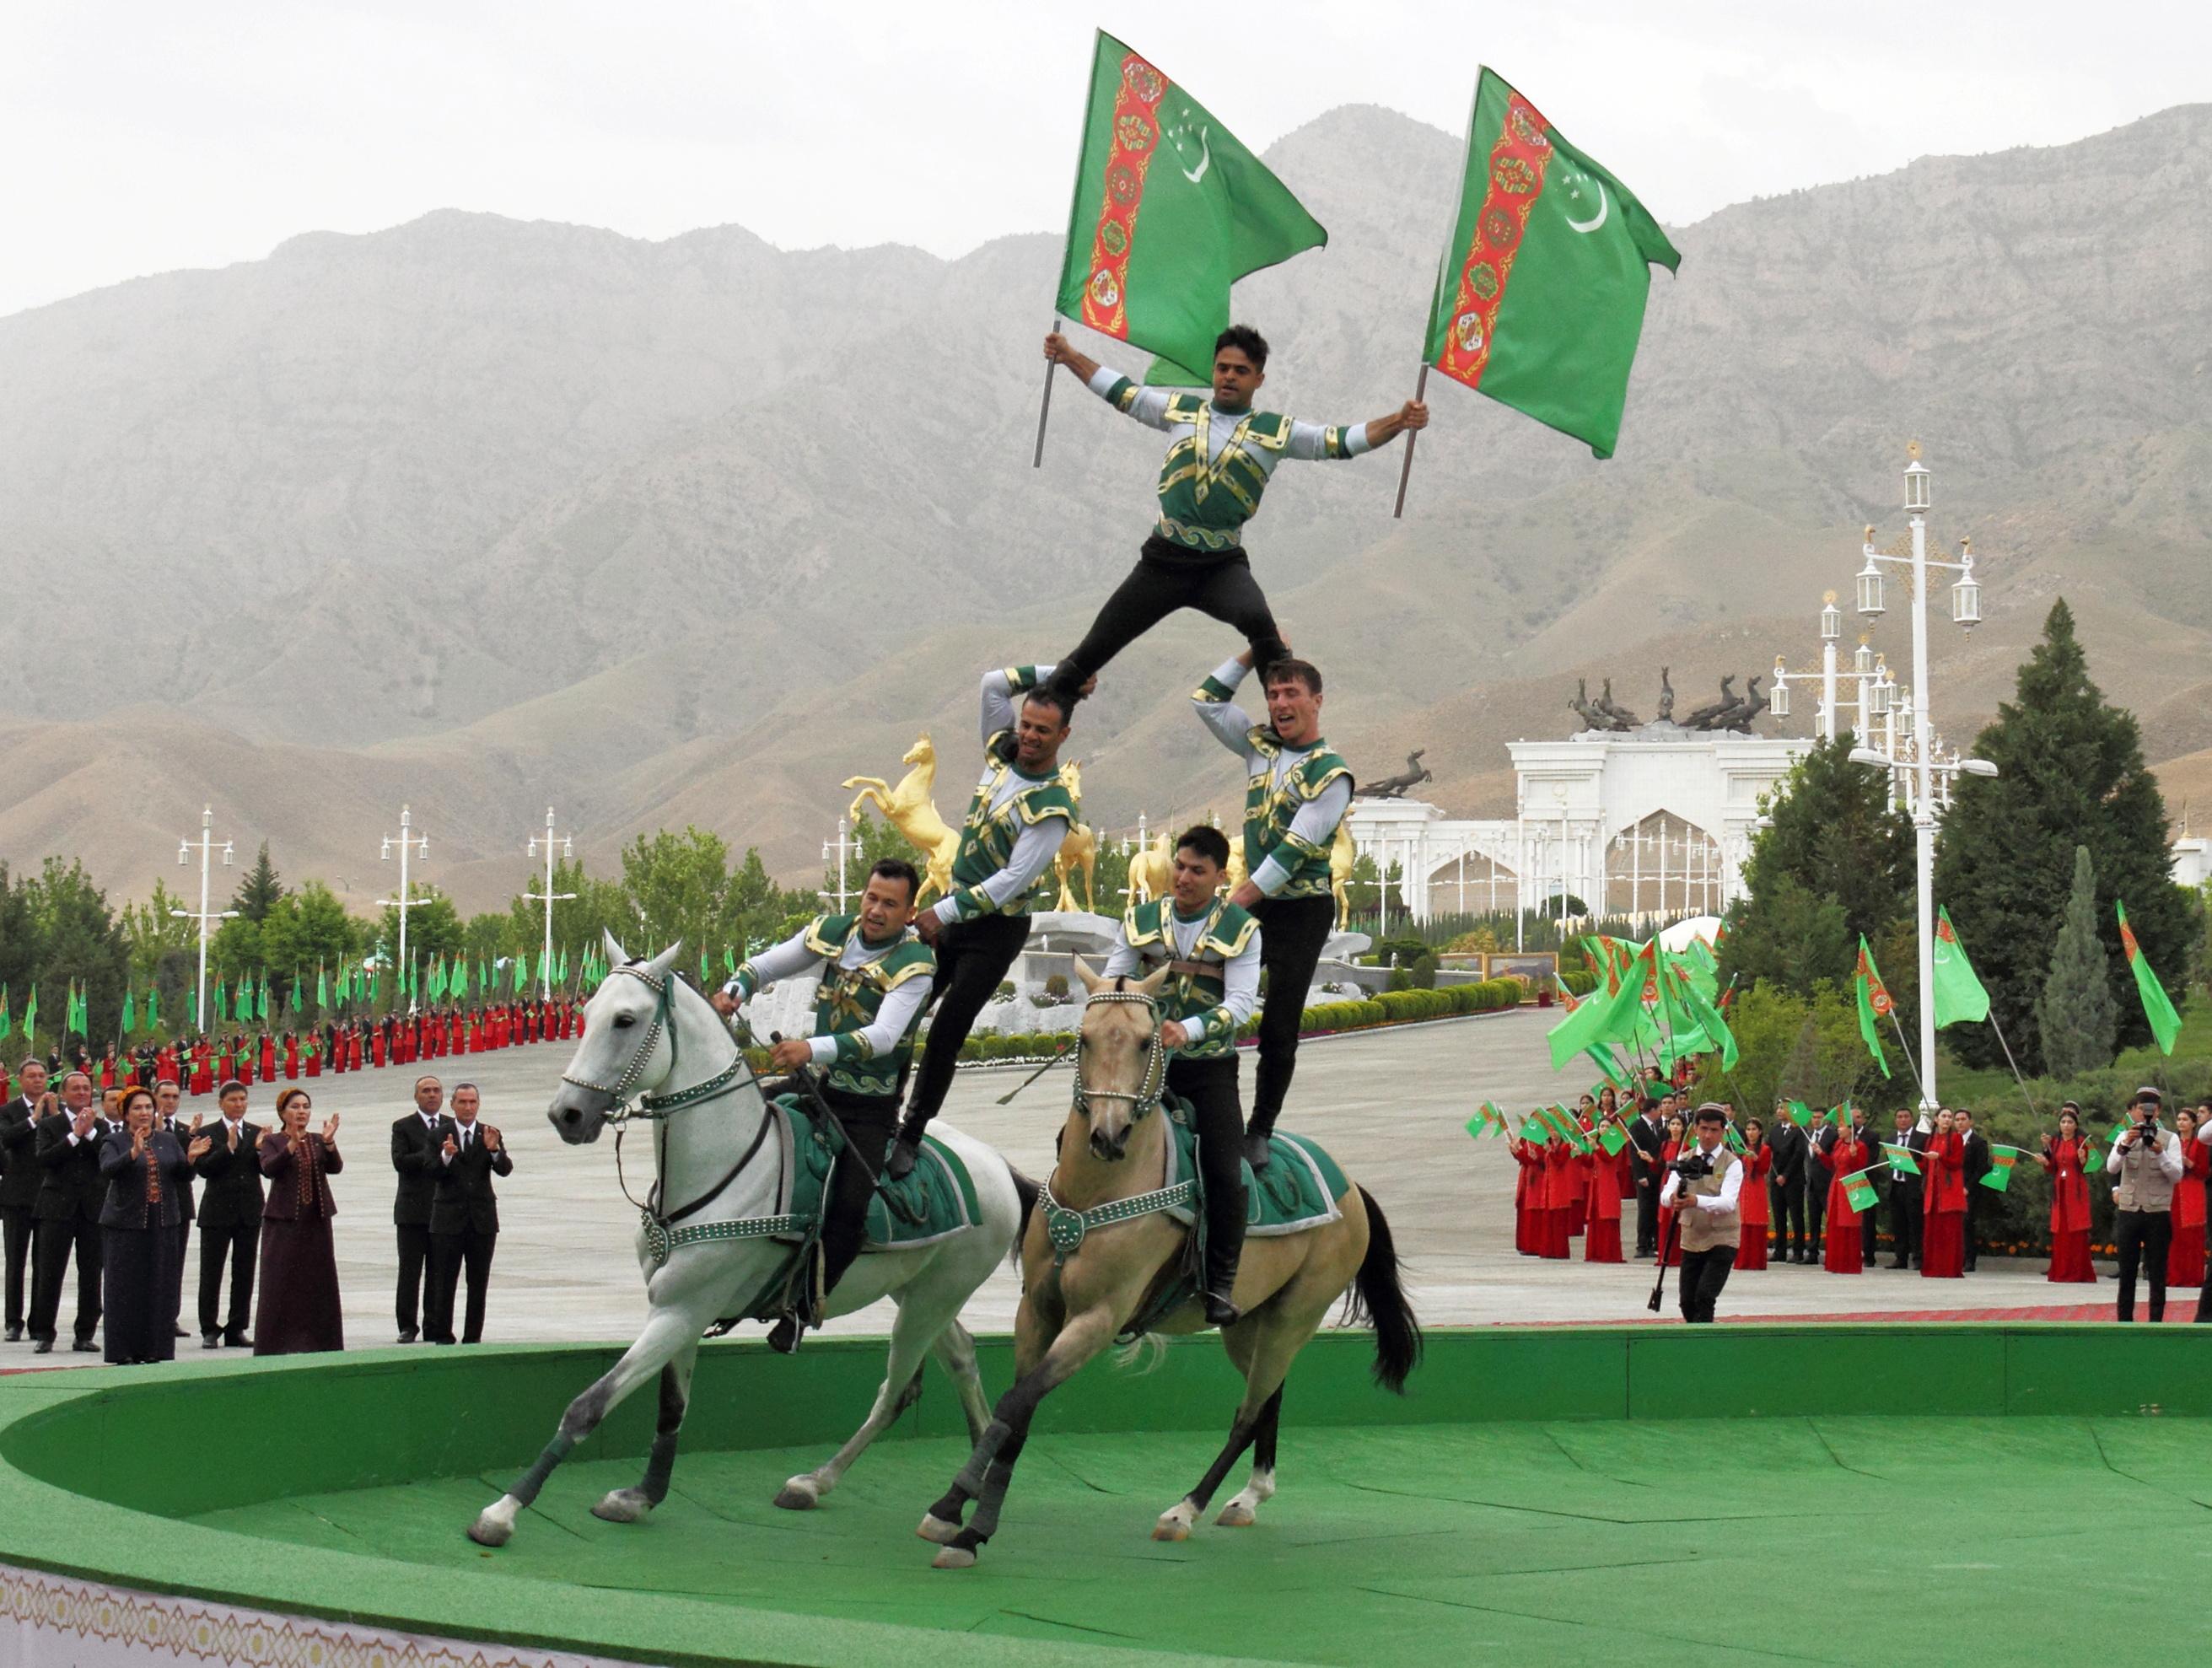 Horsemen perform during celebrations for the national Turkmen Horse Day and the Turkmen Shepherd Dog Day near Ashgabat, Turkmenistan April 25, 2021. REUTERS/Vyacheslav Sarkisyan